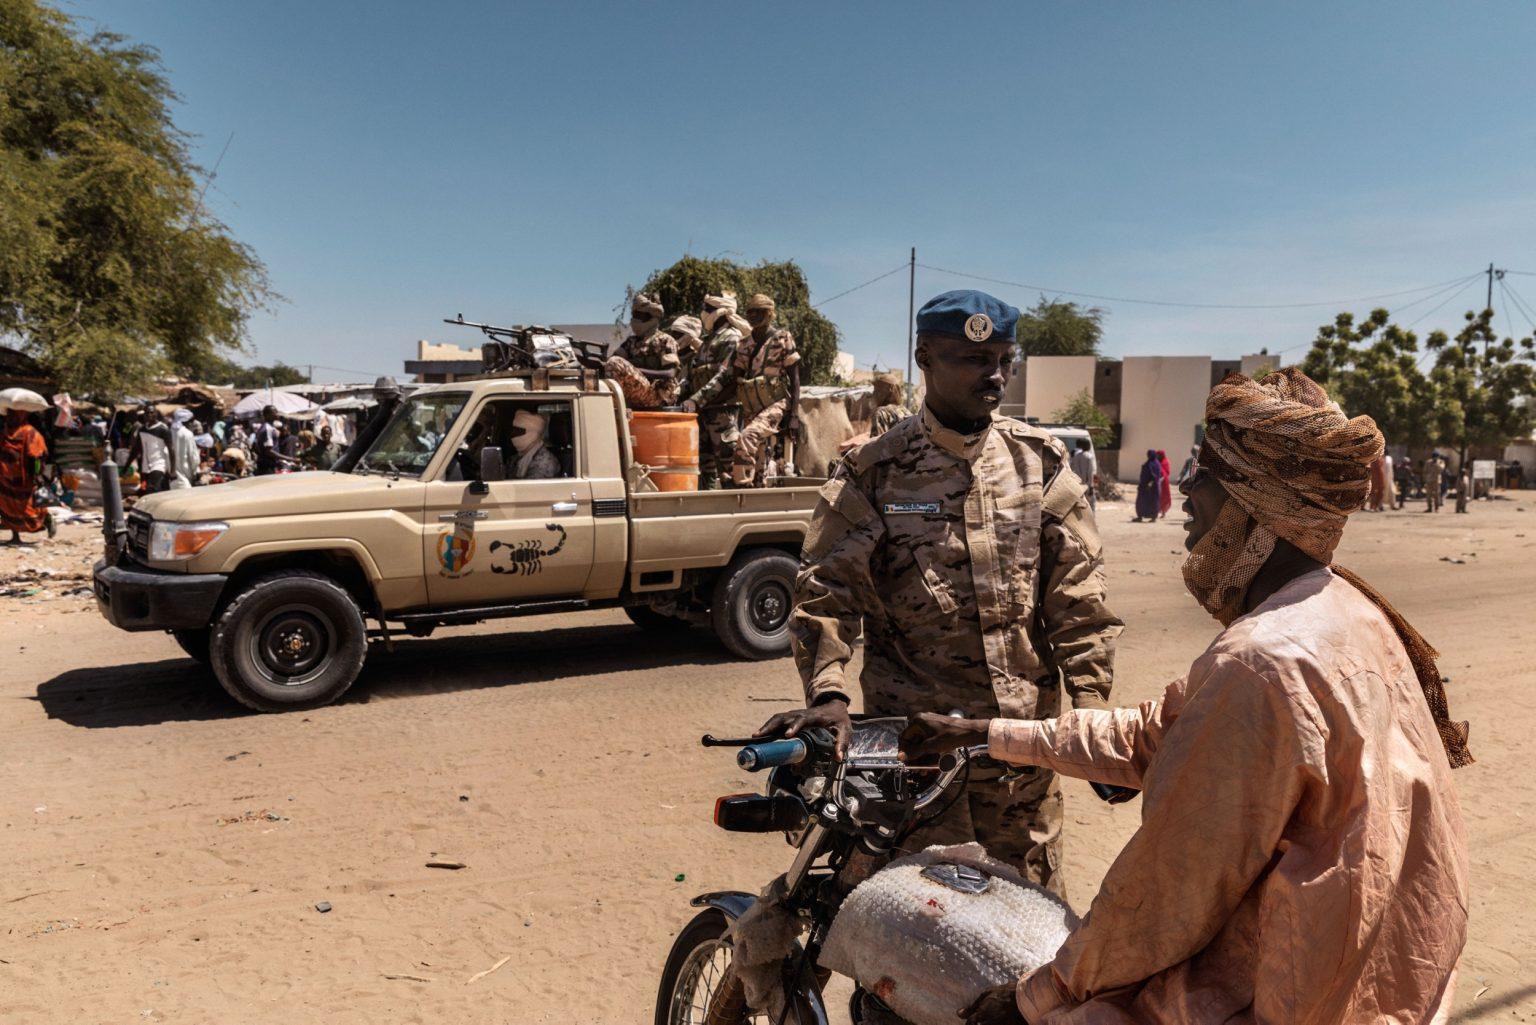 Africa, Chad, Bol, October 2018 - The Chadian army is involved in a number of anti-terrorism missions throughout the Sahel. The ANT is a very active presence in the Lake Chad basin and the islands, where Boko Haram?s men are hiding. >< Africa, Ciad, Bol, Ottobre 2018 - L'armata Chadiana è coinvolta in diverse missioni anti-terrorismo nel Sahel. La ANT è una presenza attiva nel bacino del lago Ciad e nelle isole, dove si nascondono gli uomini di Boko Haram.*** SPECIAL   FEE   APPLIES *** *** Local Caption *** 01362899